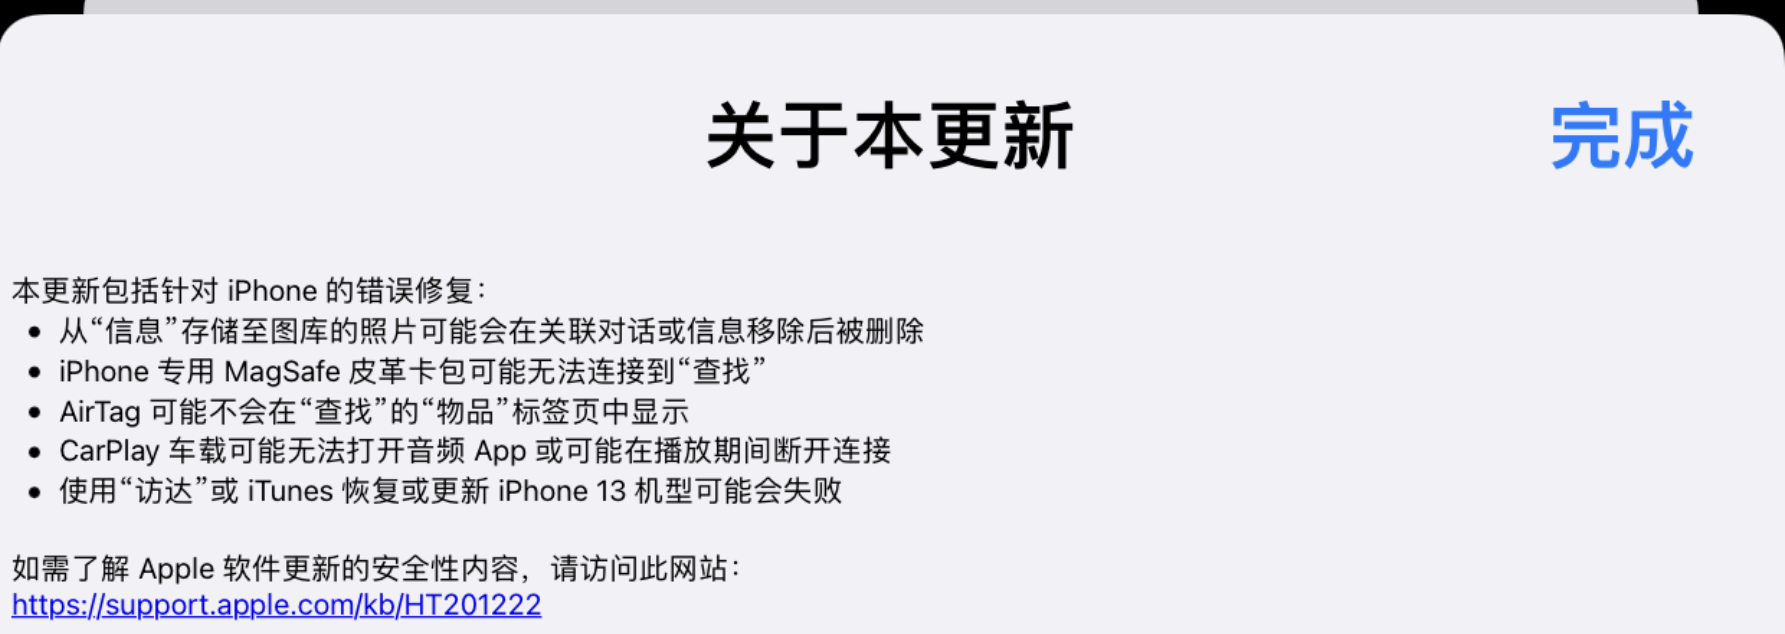 QQ截图20211012104311.png